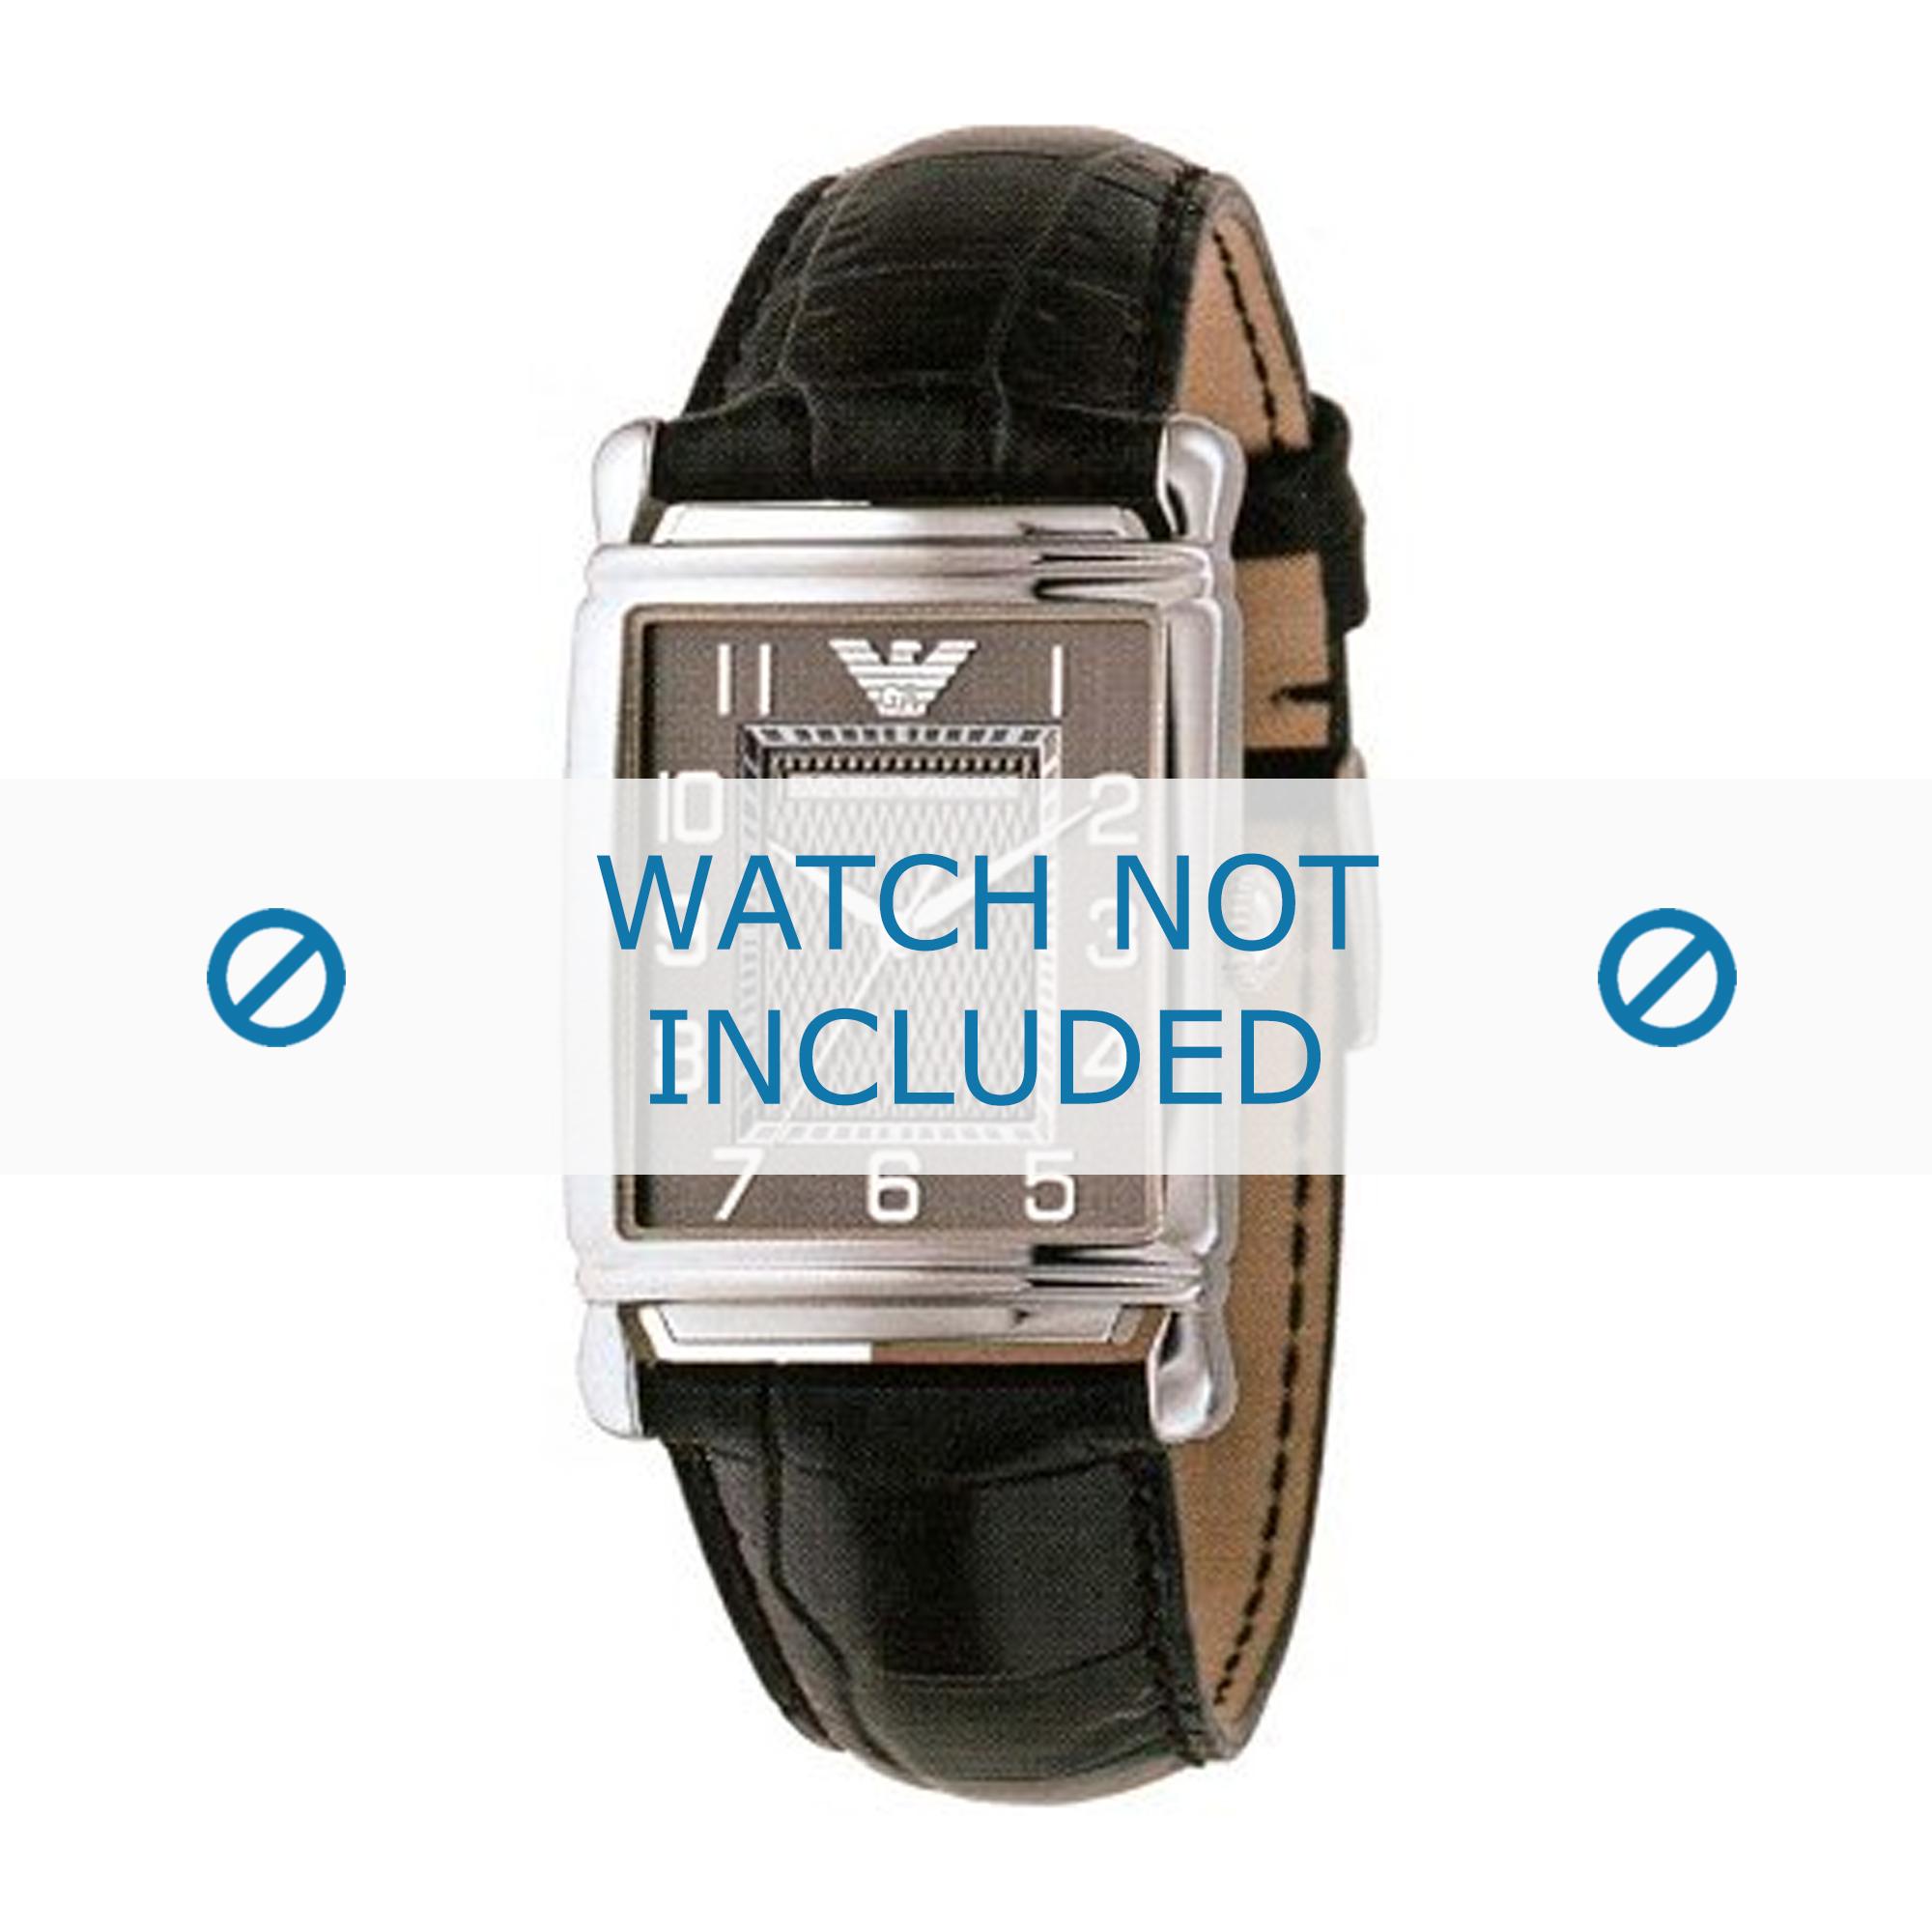 Armani horlogeband AR0423 Leder Zwart 22mm + zwart stiksel